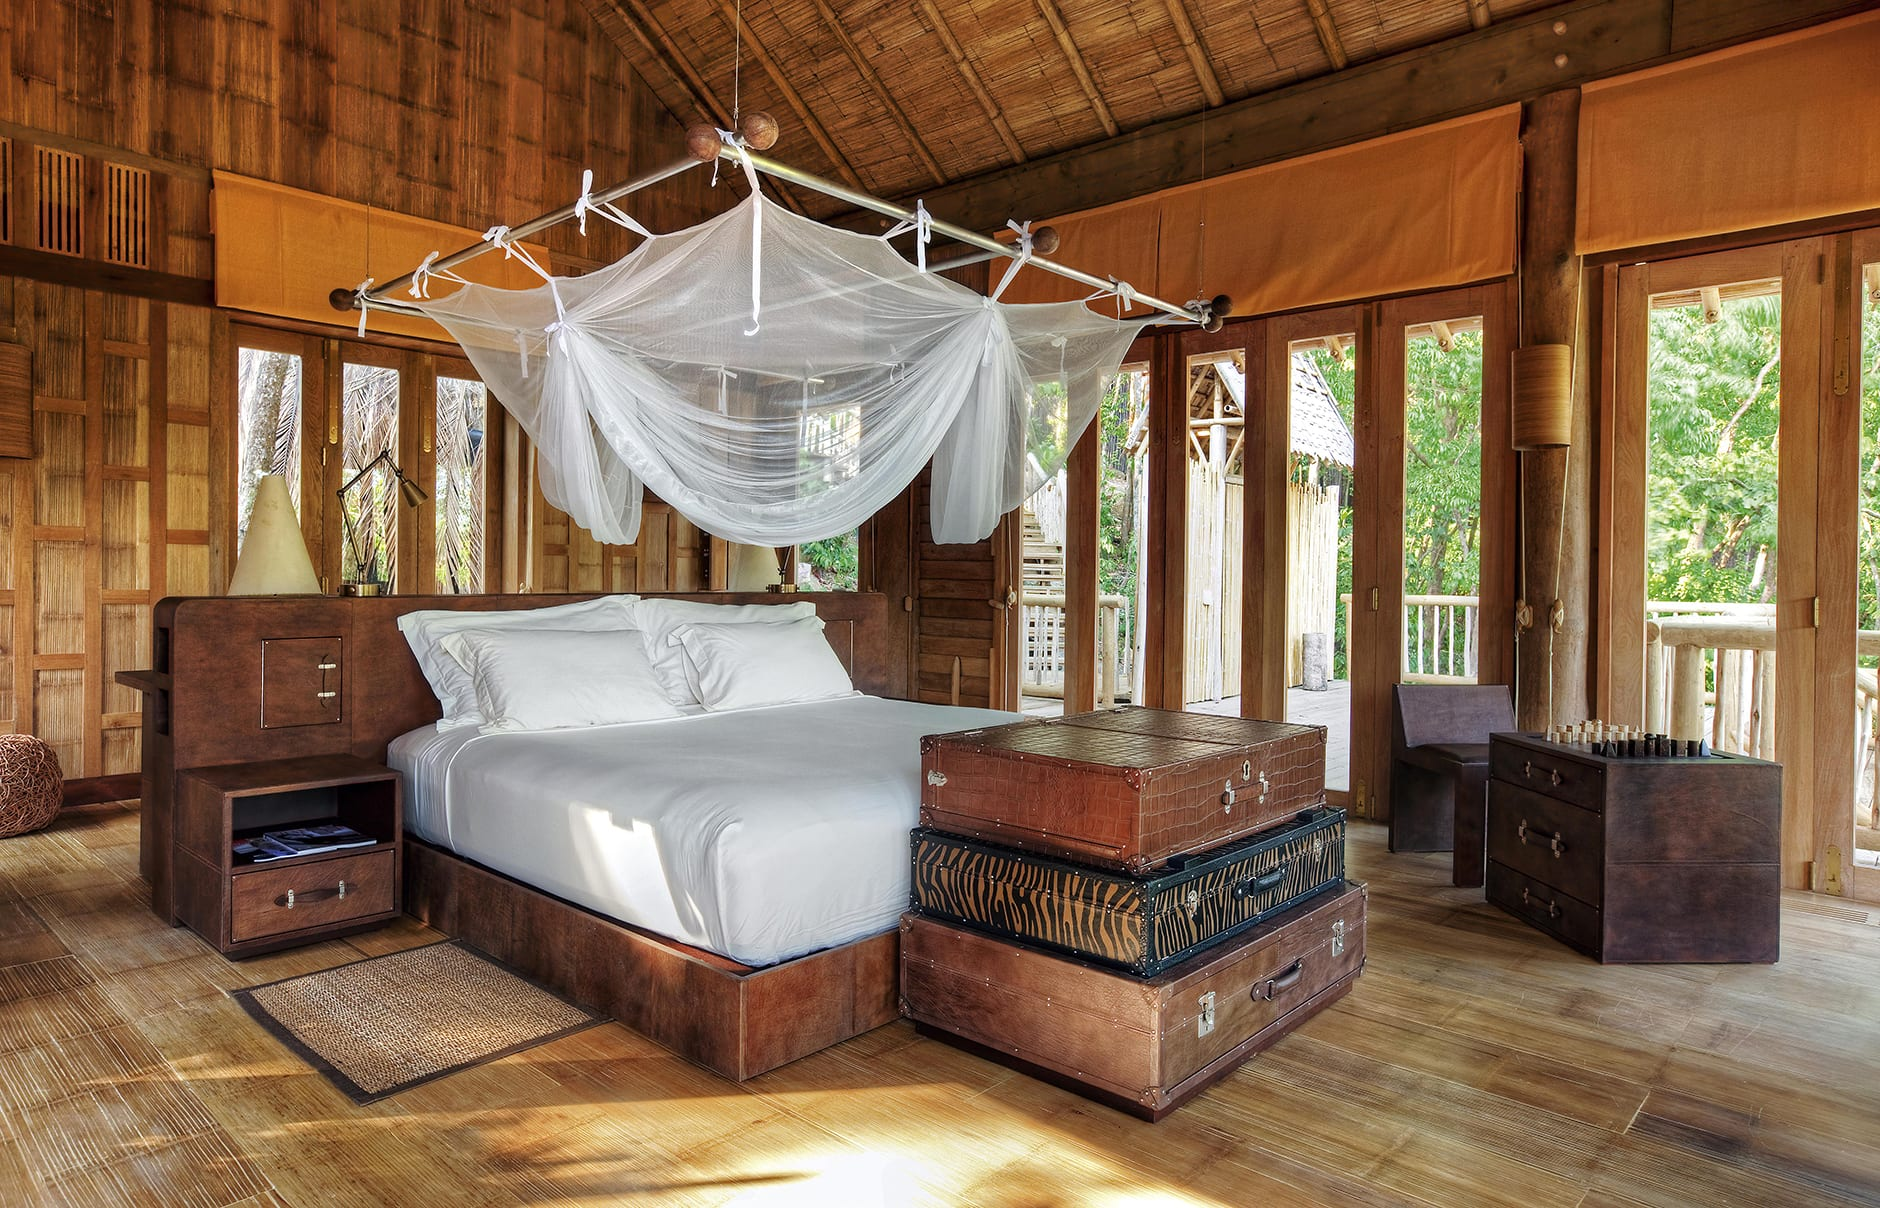 Hill Pool Villa bedroom. Soneva Kiri, Koh Kood, Thailand. © Soneva.com